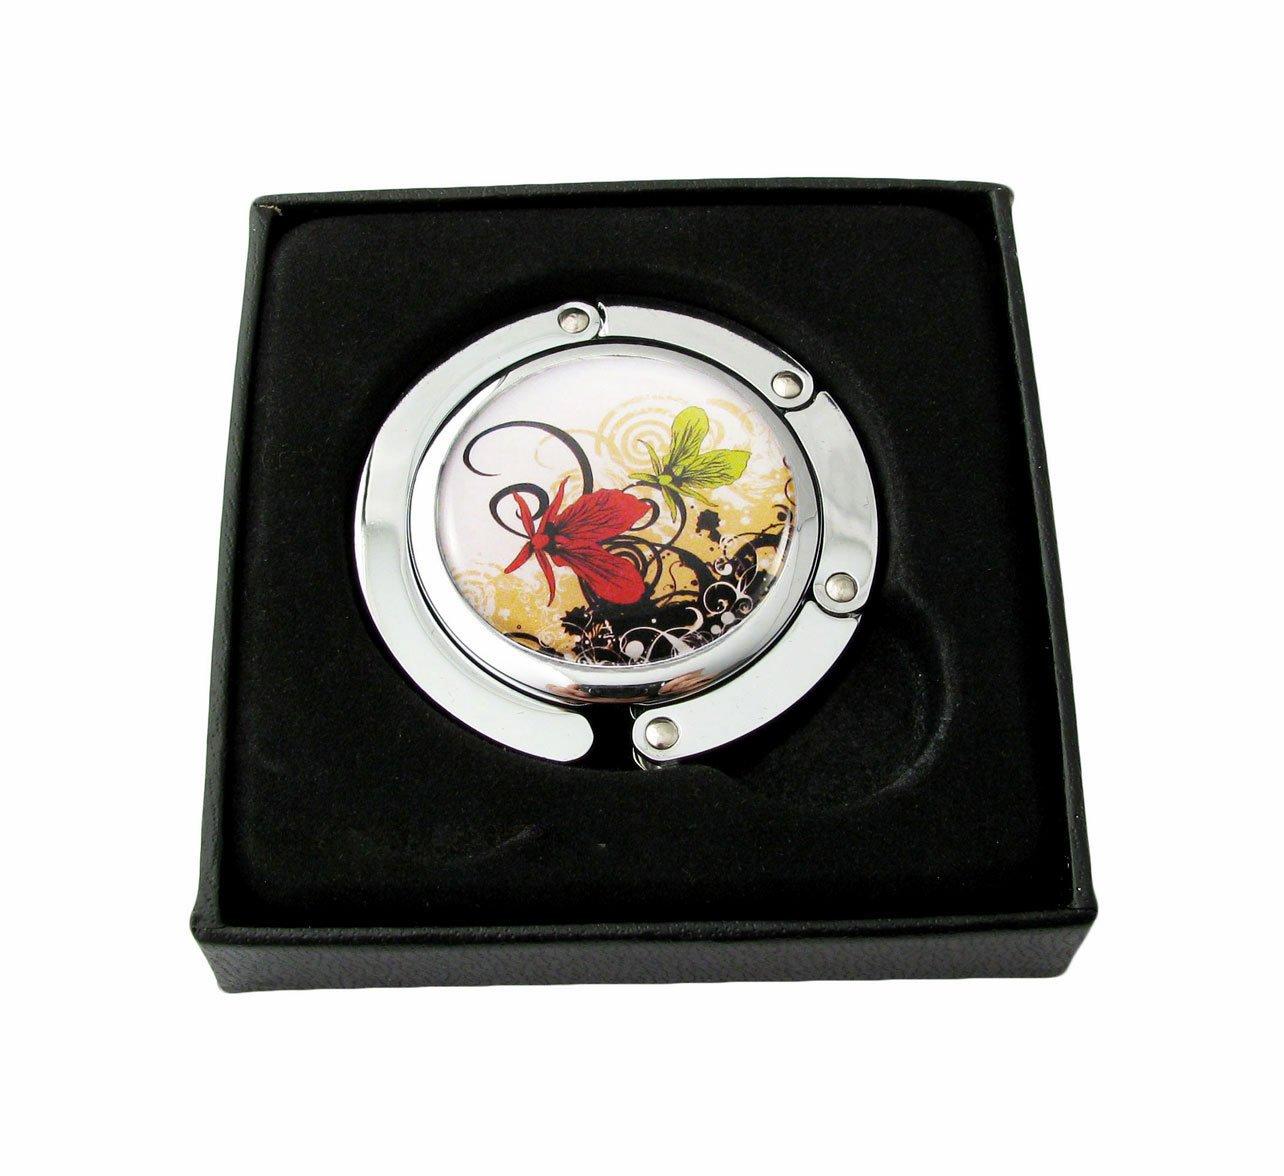 Handtaschenhalter - Taschenhalter Tisch - Papillons Volutes Design BagCentre 3662918000489